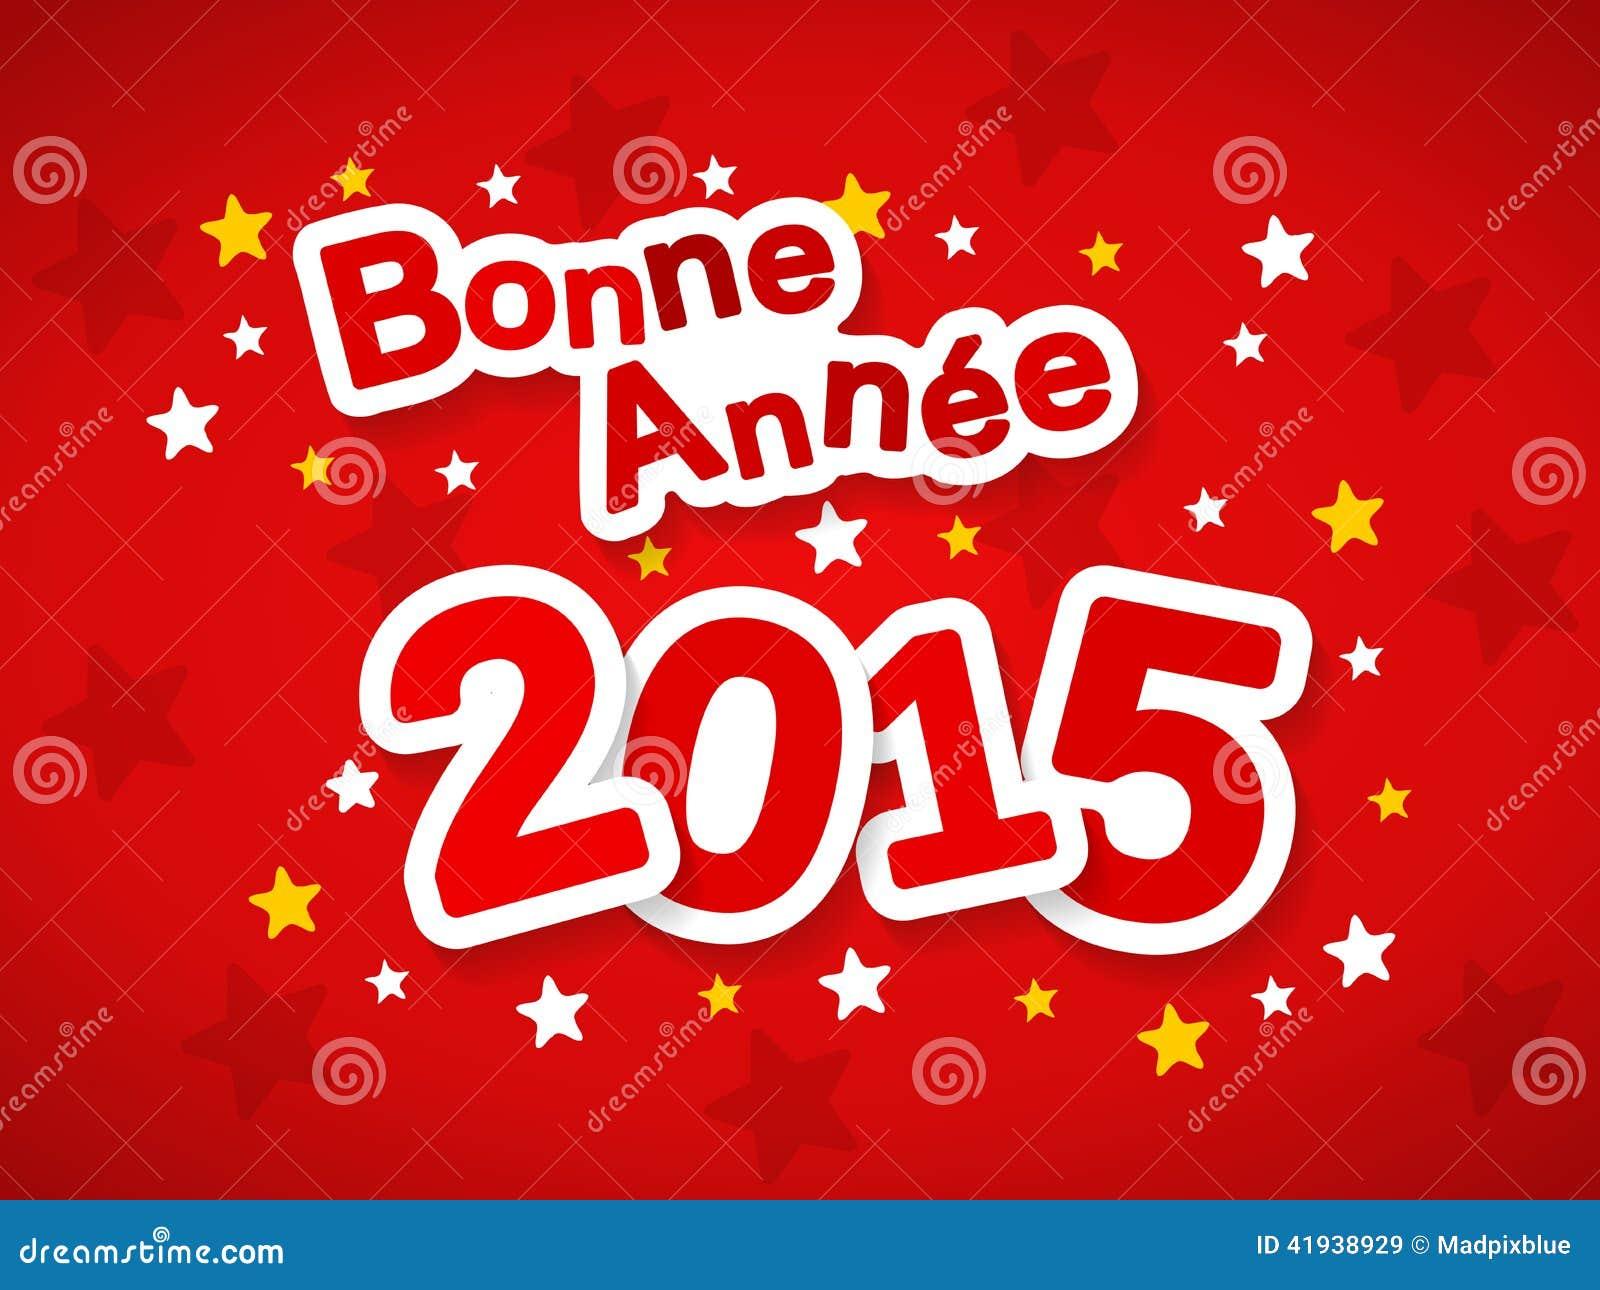 Bonne Annee 2015 Stock Vector - Image: 41938929